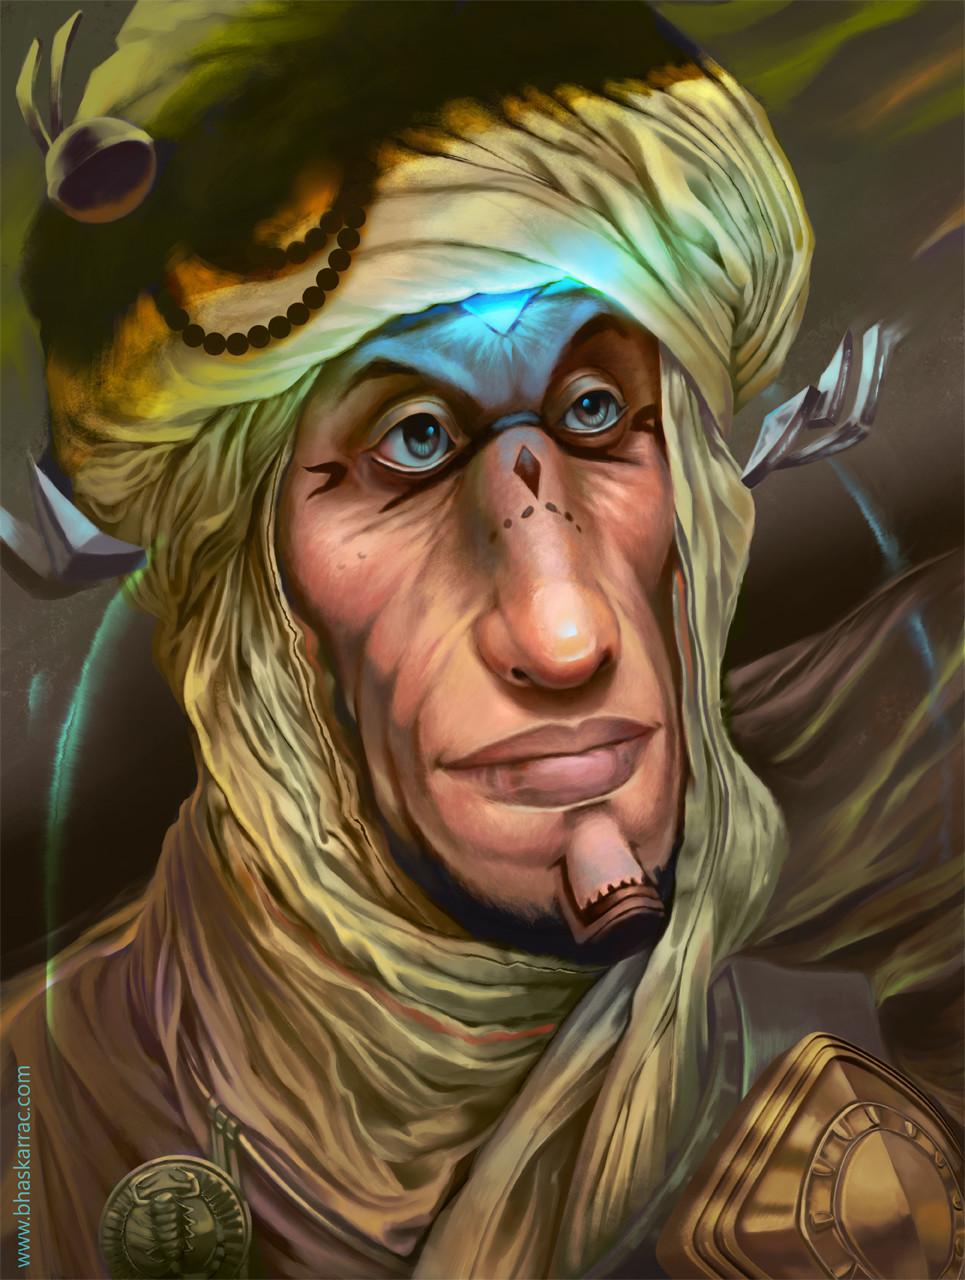 The Holy merchant